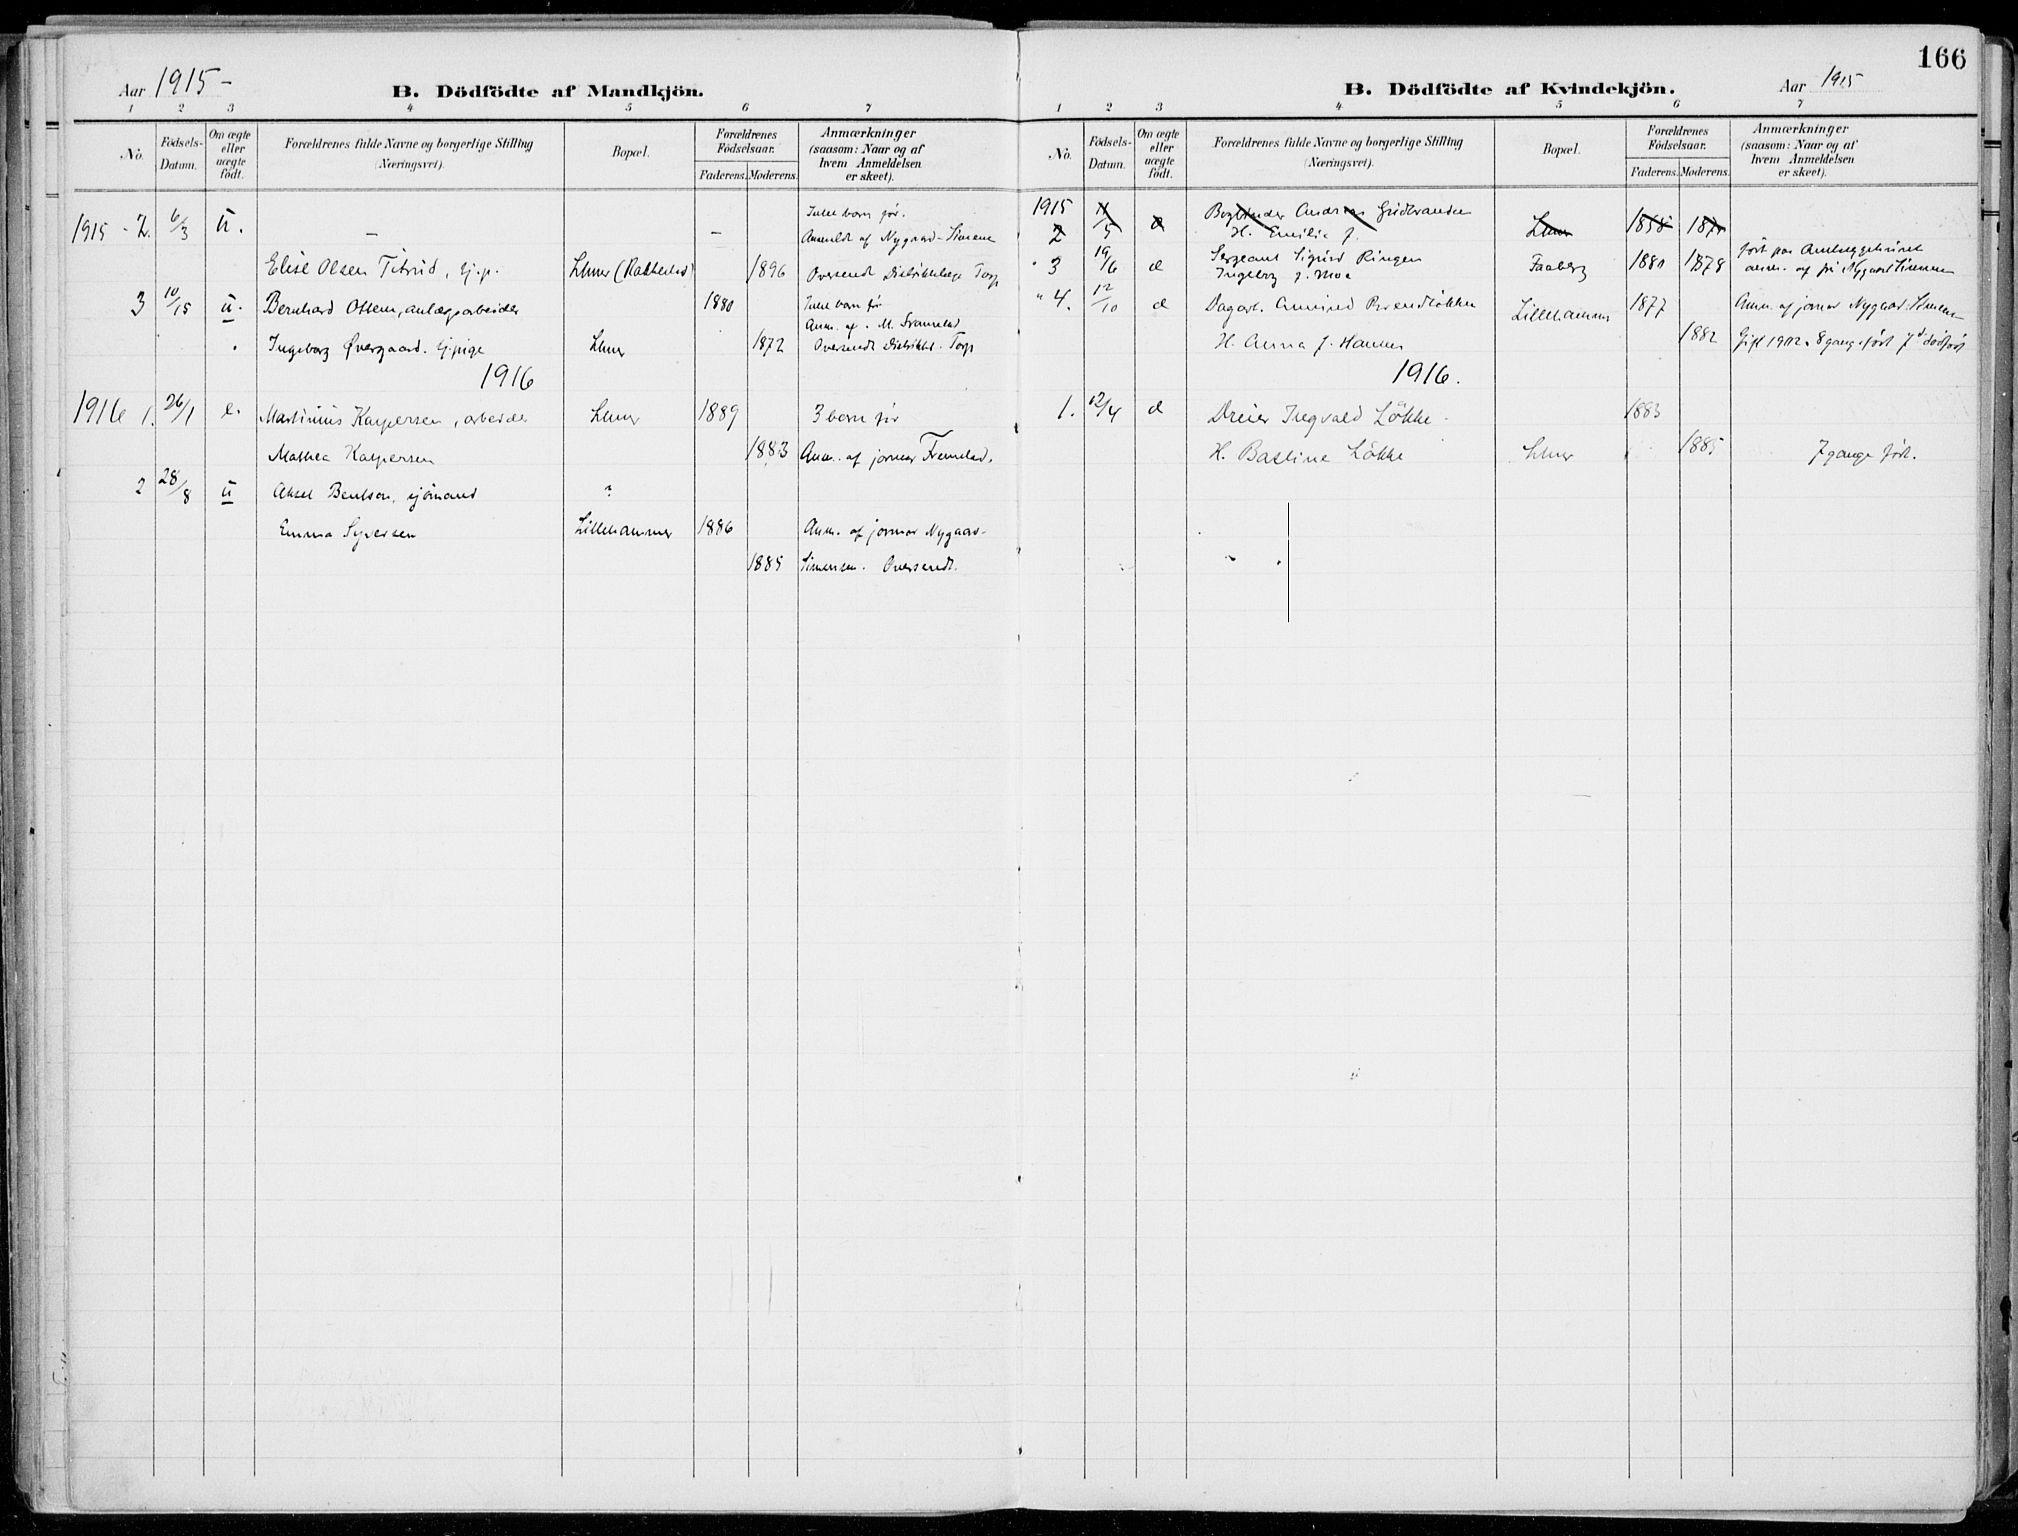 SAH, Lillehammer prestekontor, Ministerialbok nr. 1, 1901-1916, s. 166